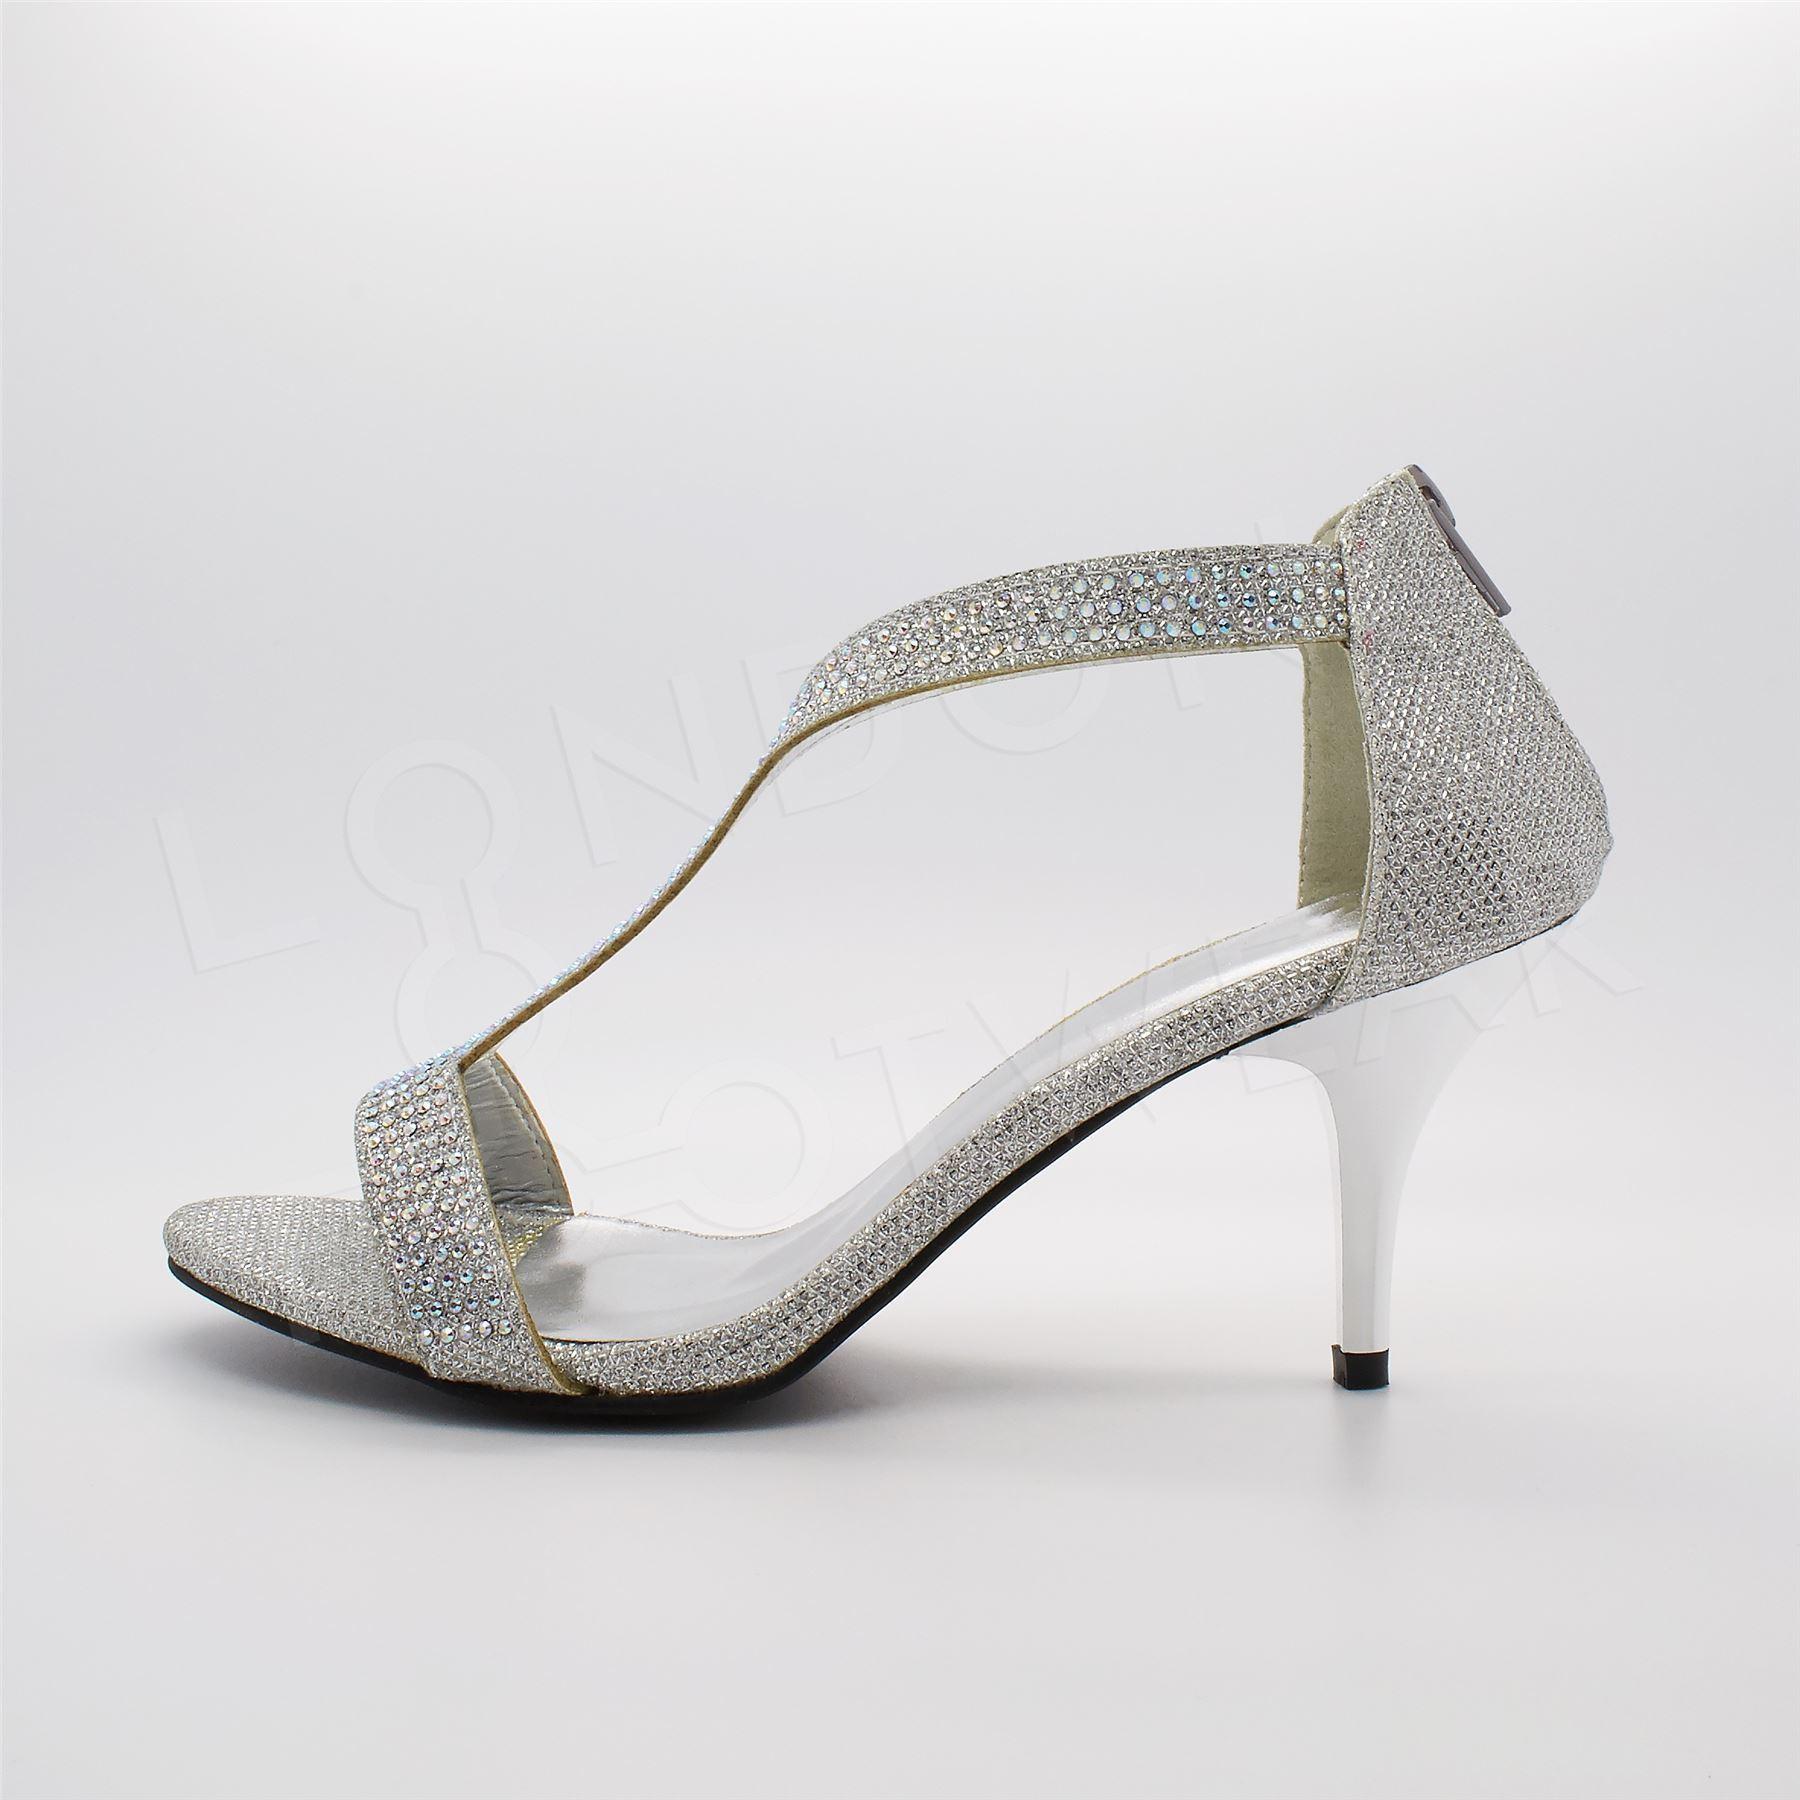 Womens Low Mid Heel Bridal Party Shoes Ladies Diamante